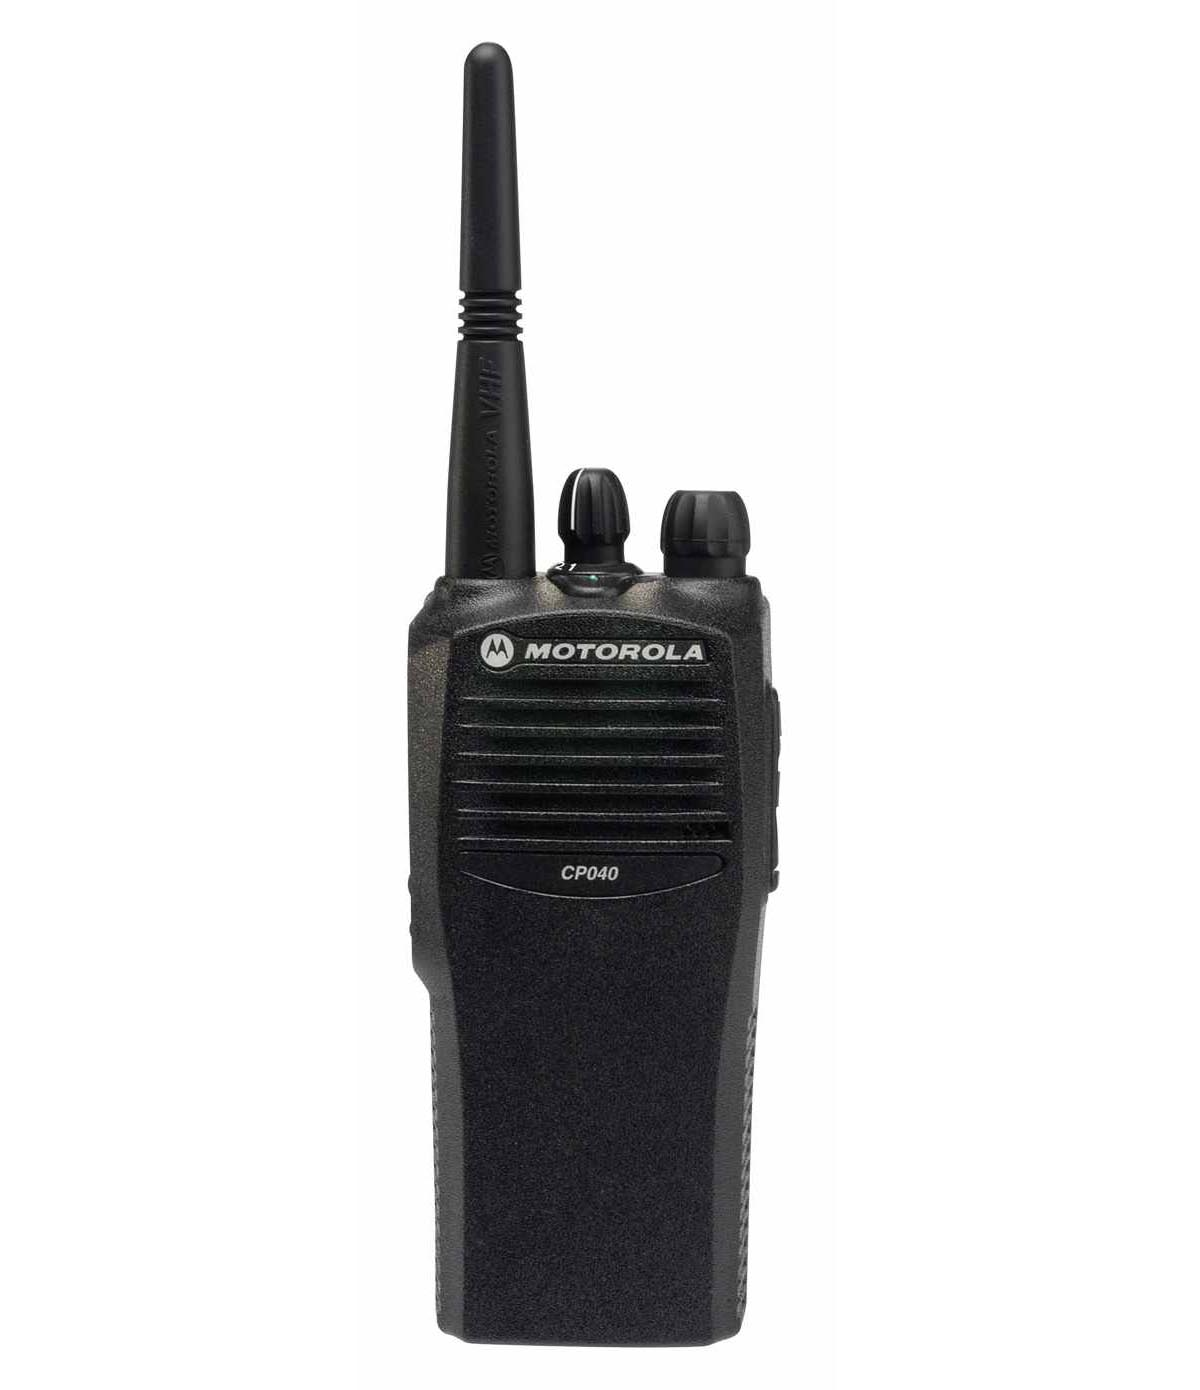 motorola cp040 basic user guide today manual guide trends sample u2022 rh brookejasmine co Motorola Microphone Motorola CP200 Radio